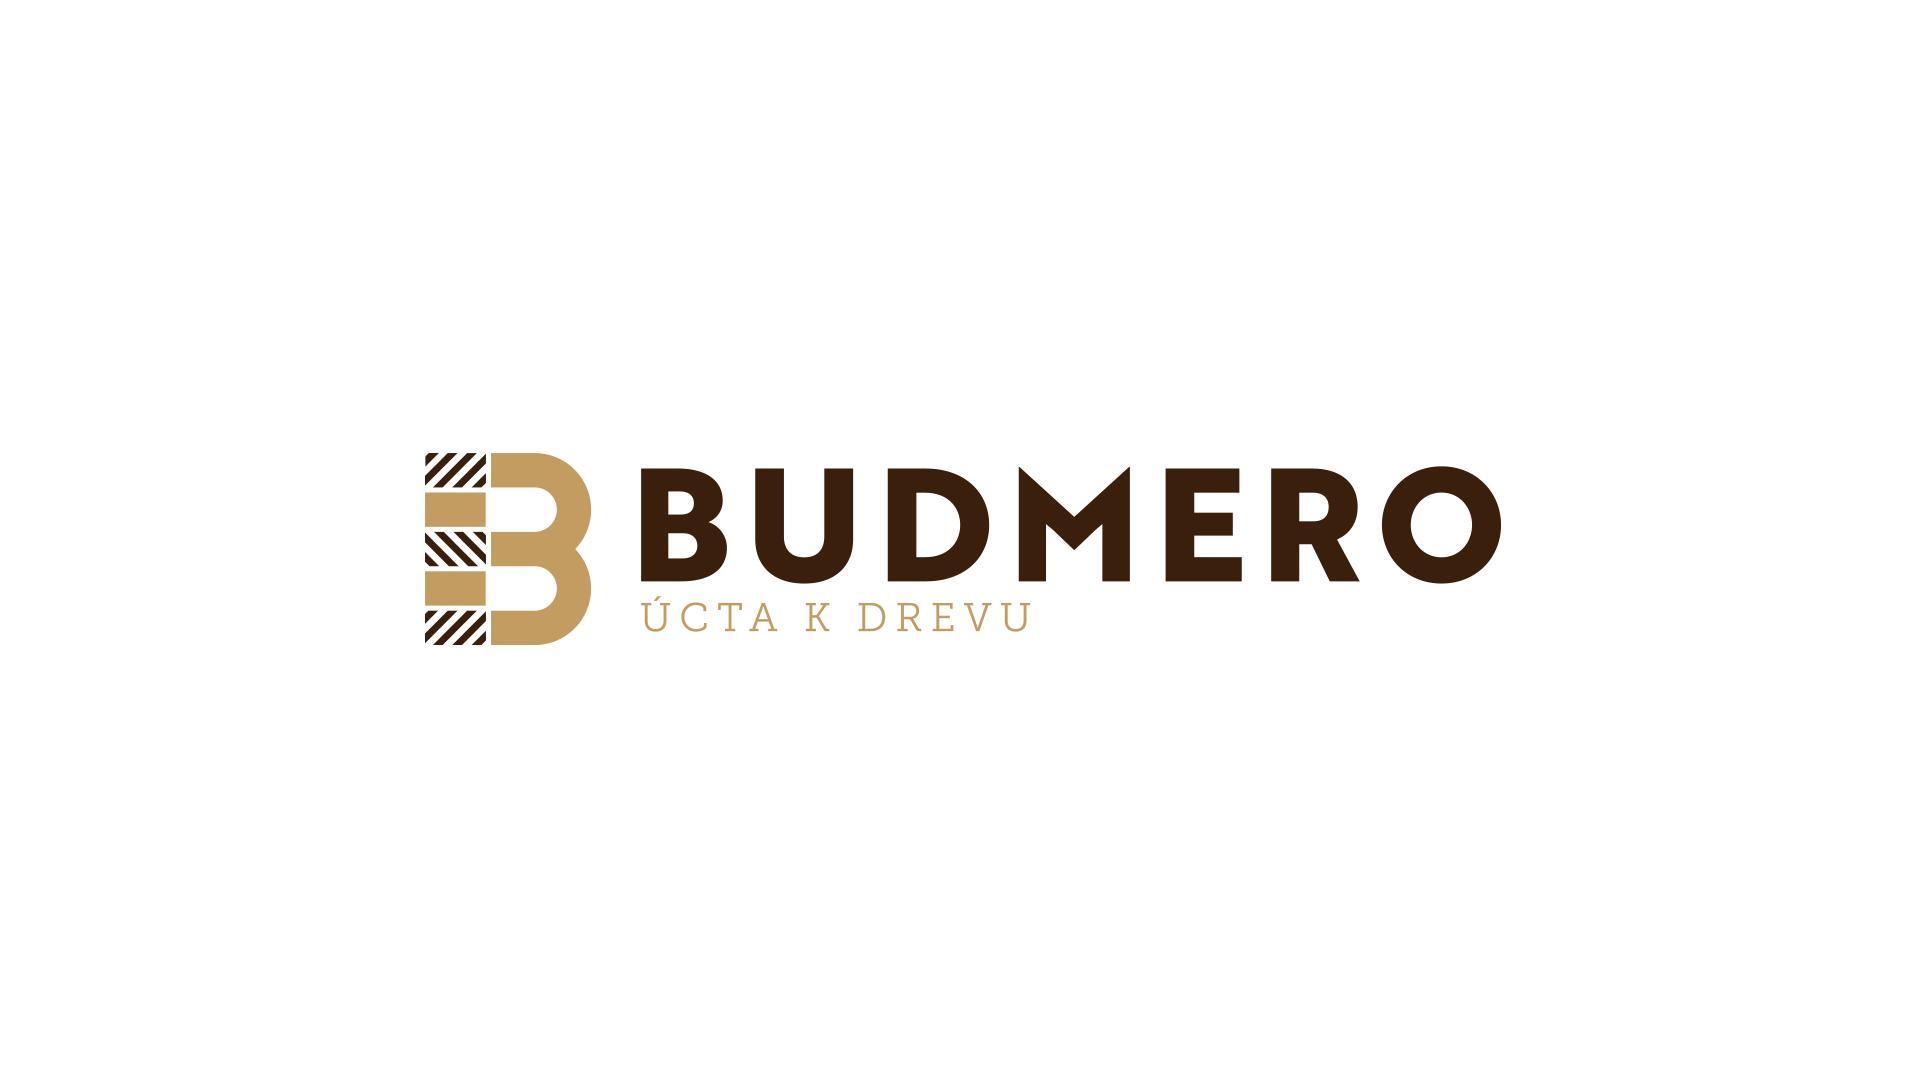 Budmero